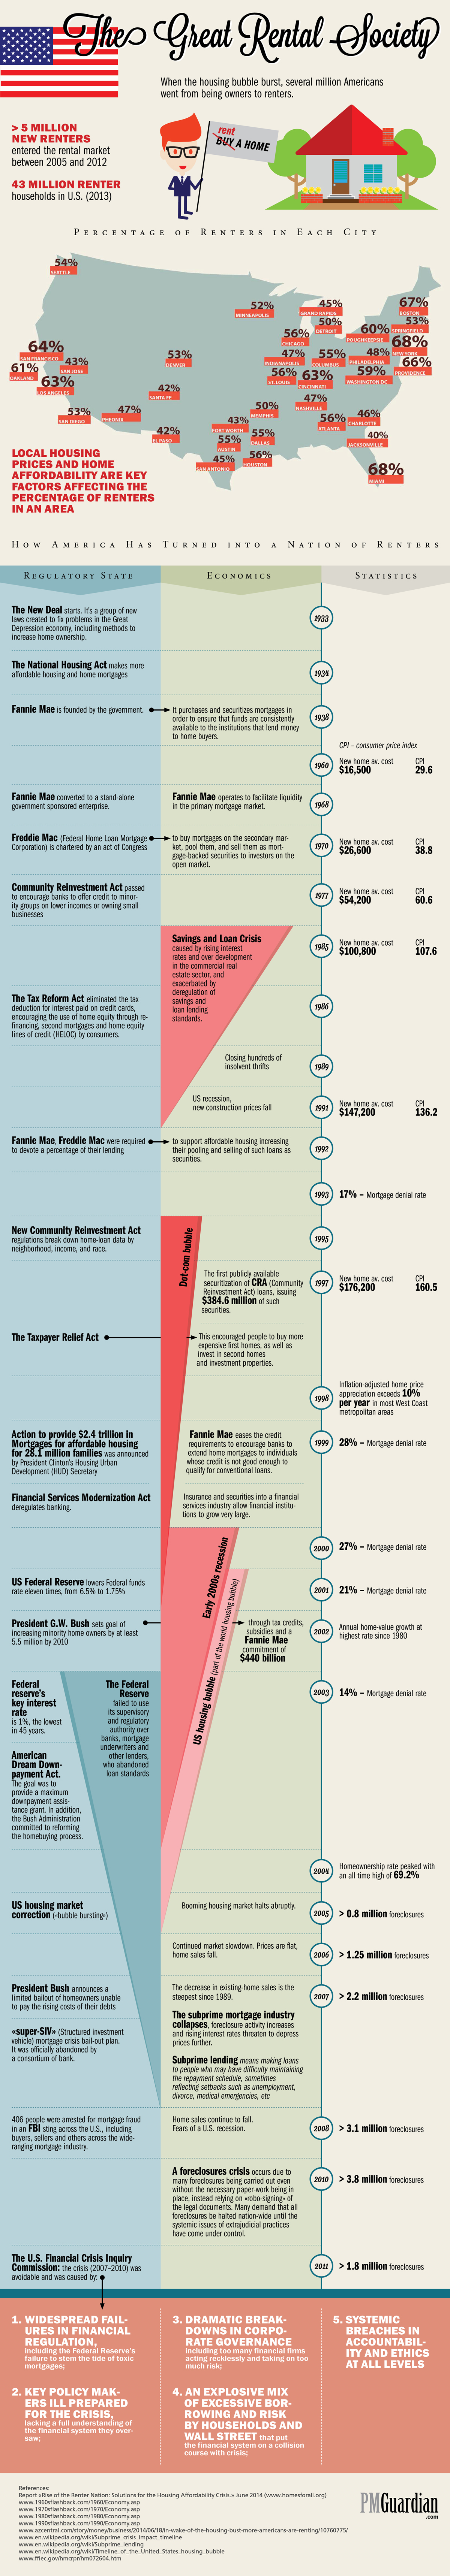 American Rental History